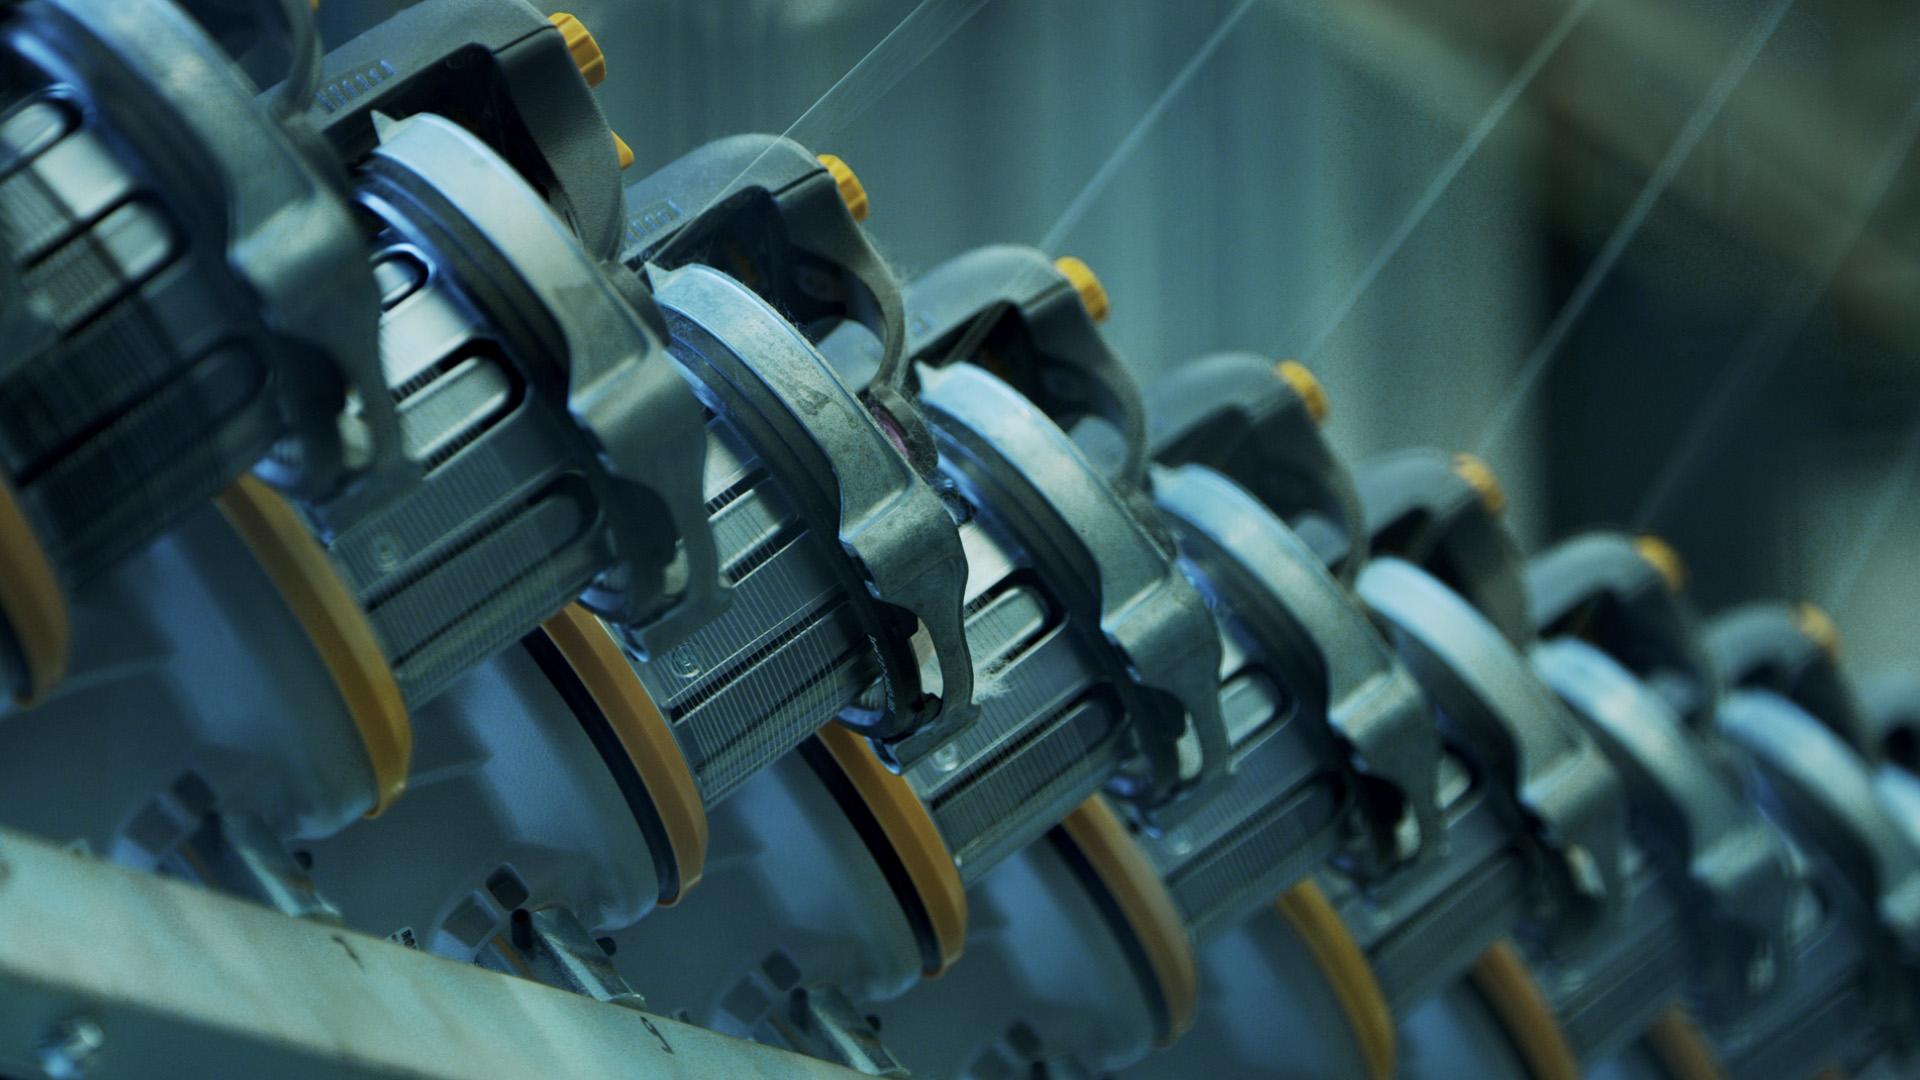 Karl-Mayer-Texture-Machine-Production-Textile_18.jpg